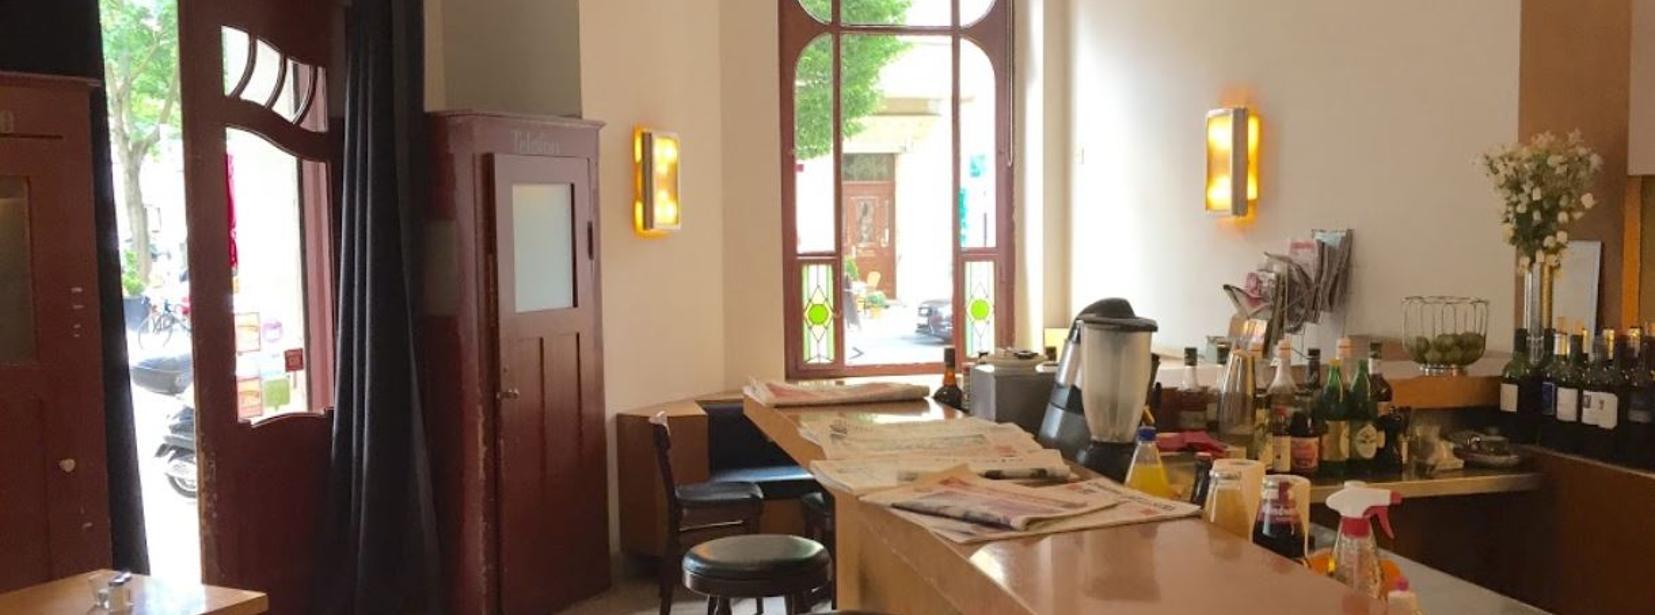 Feuerbach Café Berlin Mycityhighlight